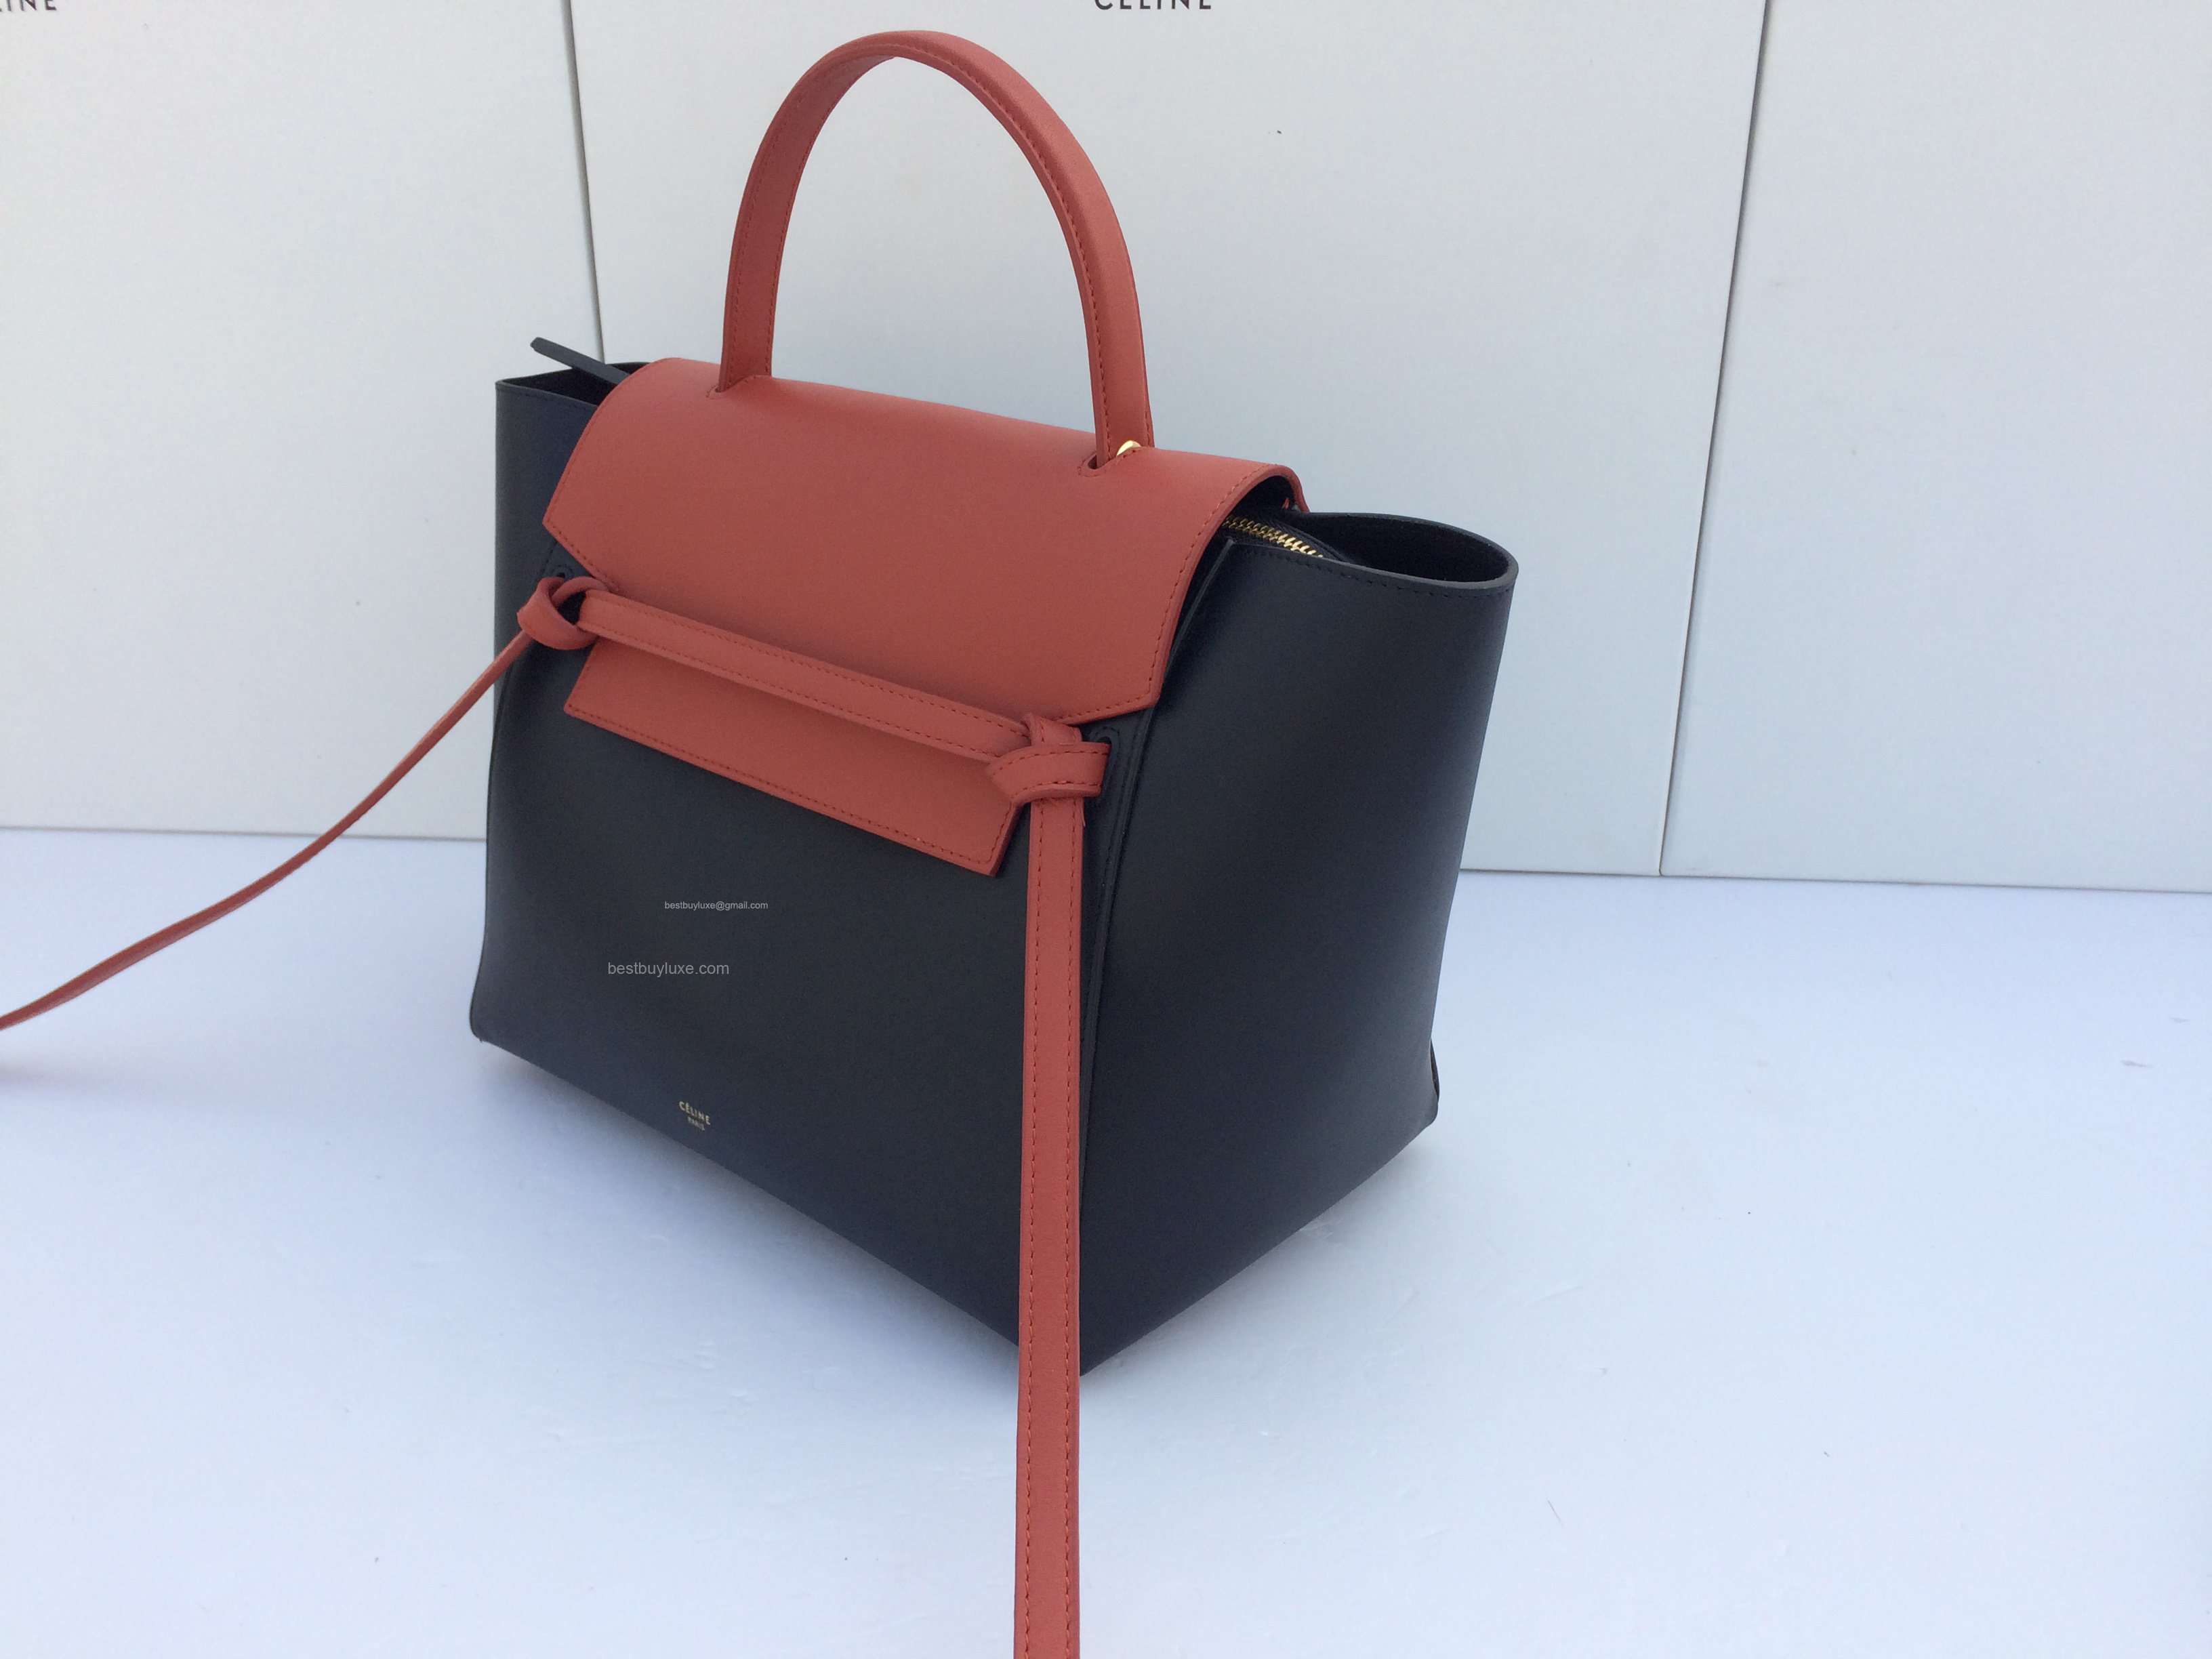 celine mini luggage red leather bag - Super Fake Celine Small Belt Bag In Calfskin Red - Replica Celine